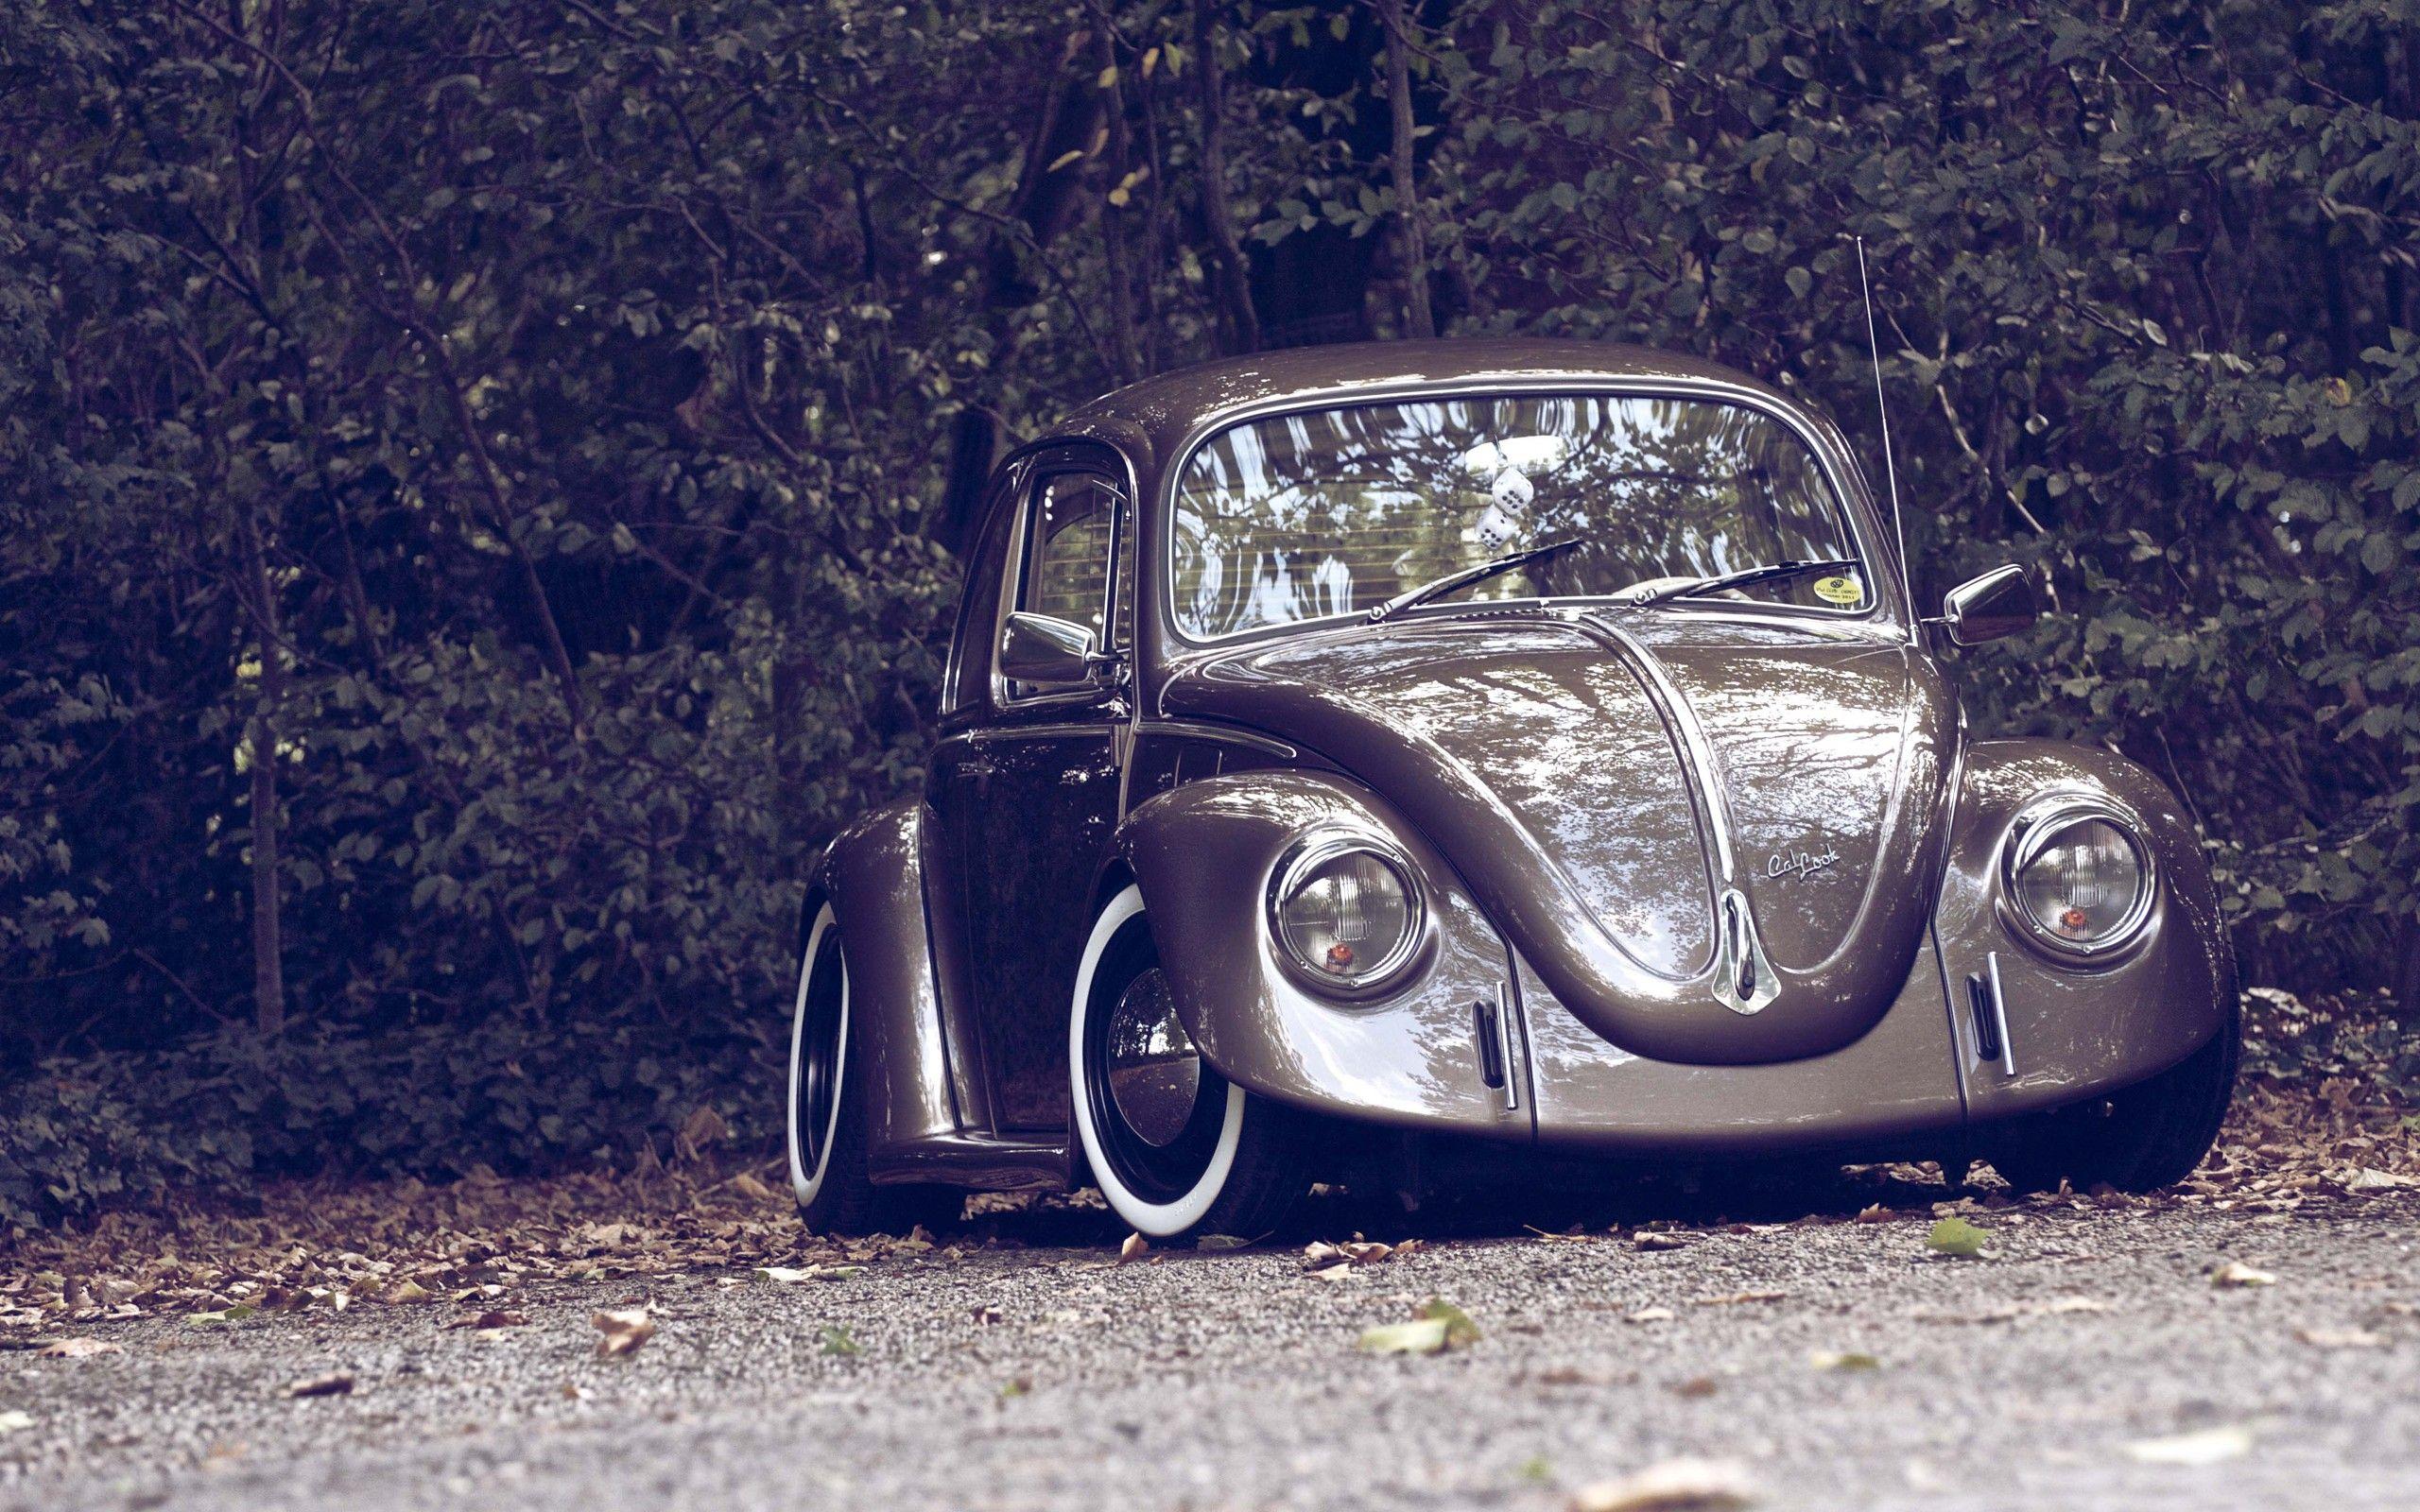 vw beetle cars wallpaper hd | fusca | pinterest | beetle car, car